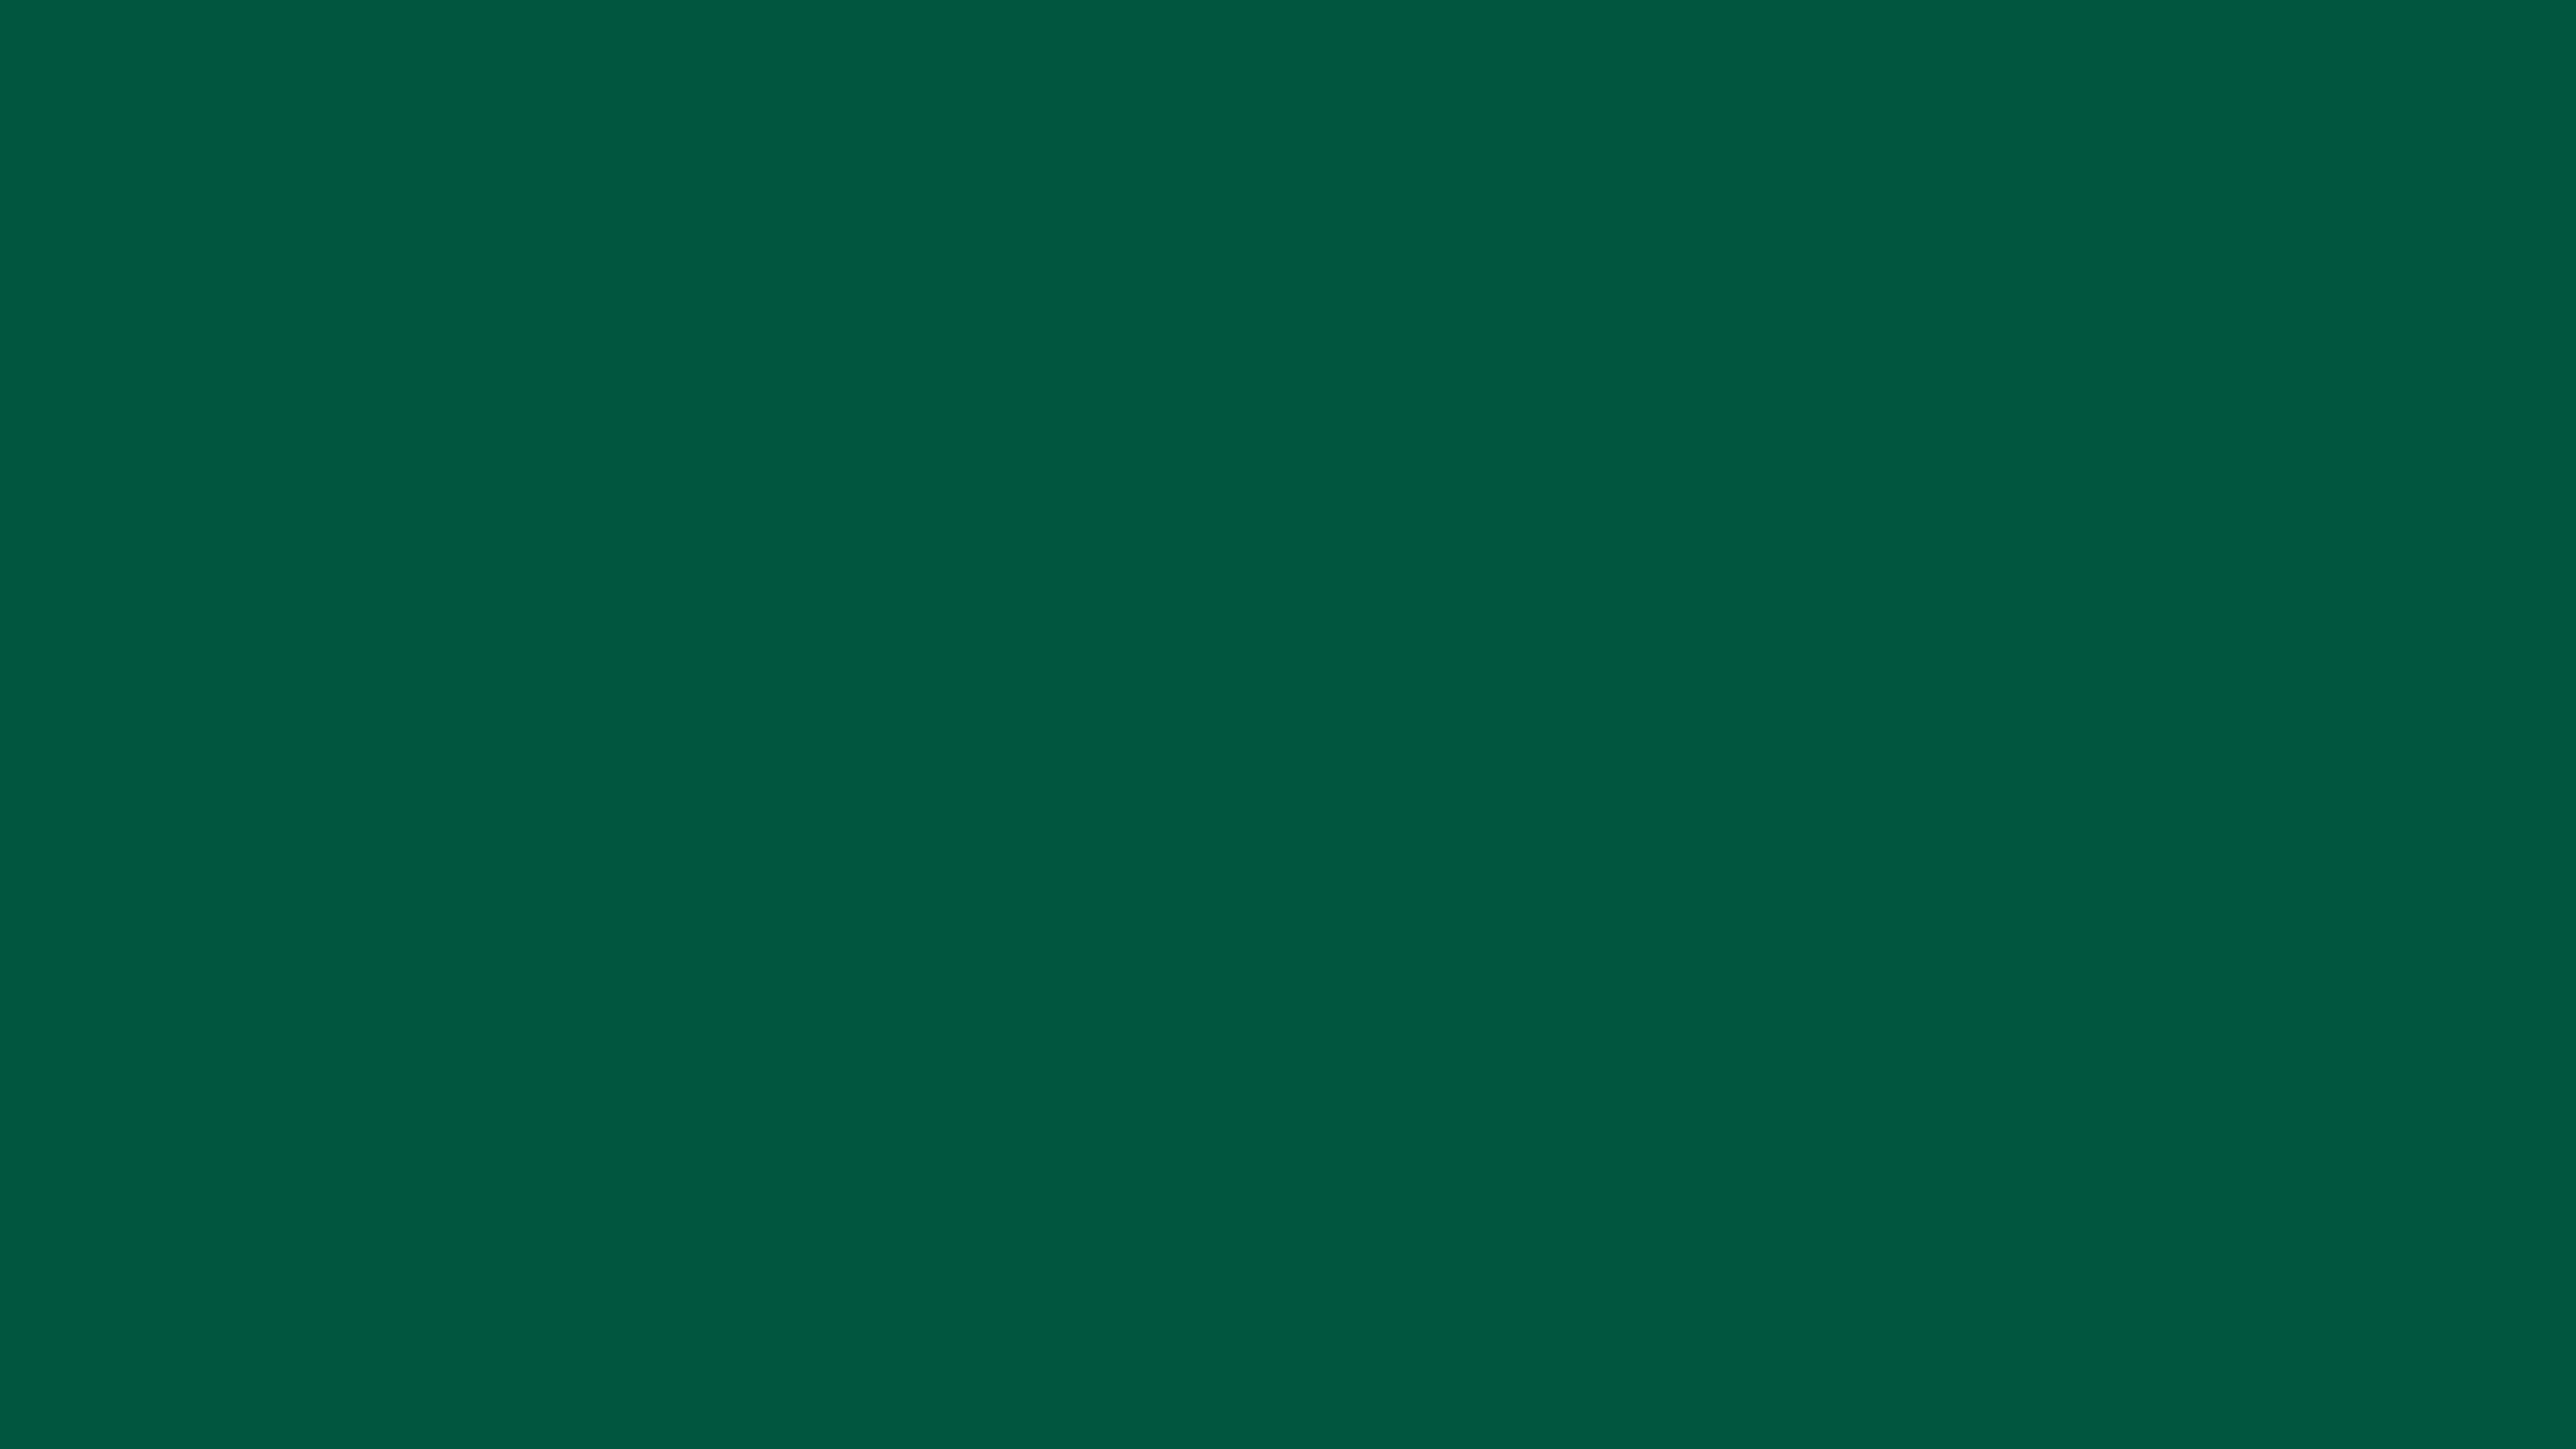 7680x4320 Castleton Green Solid Color Background